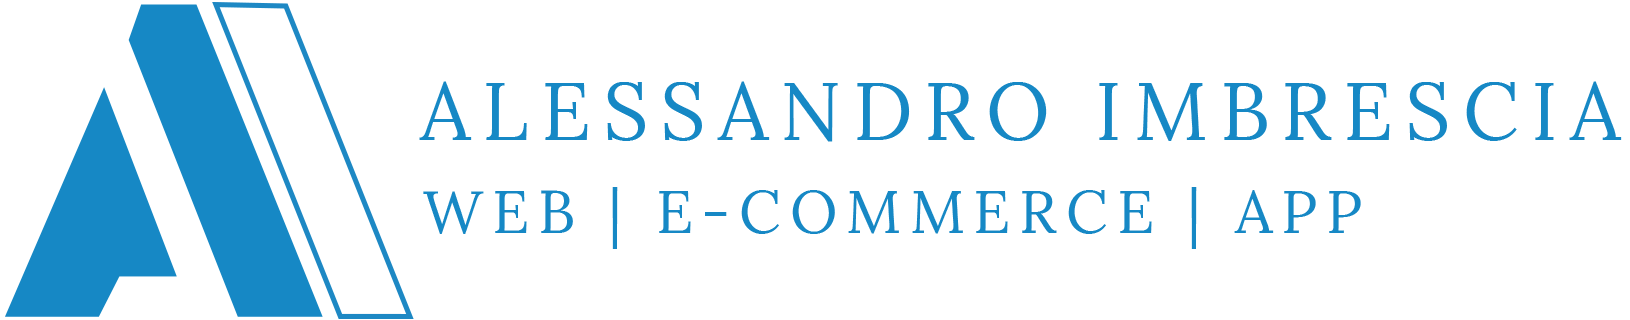 Alessandro Imbrescia Logo